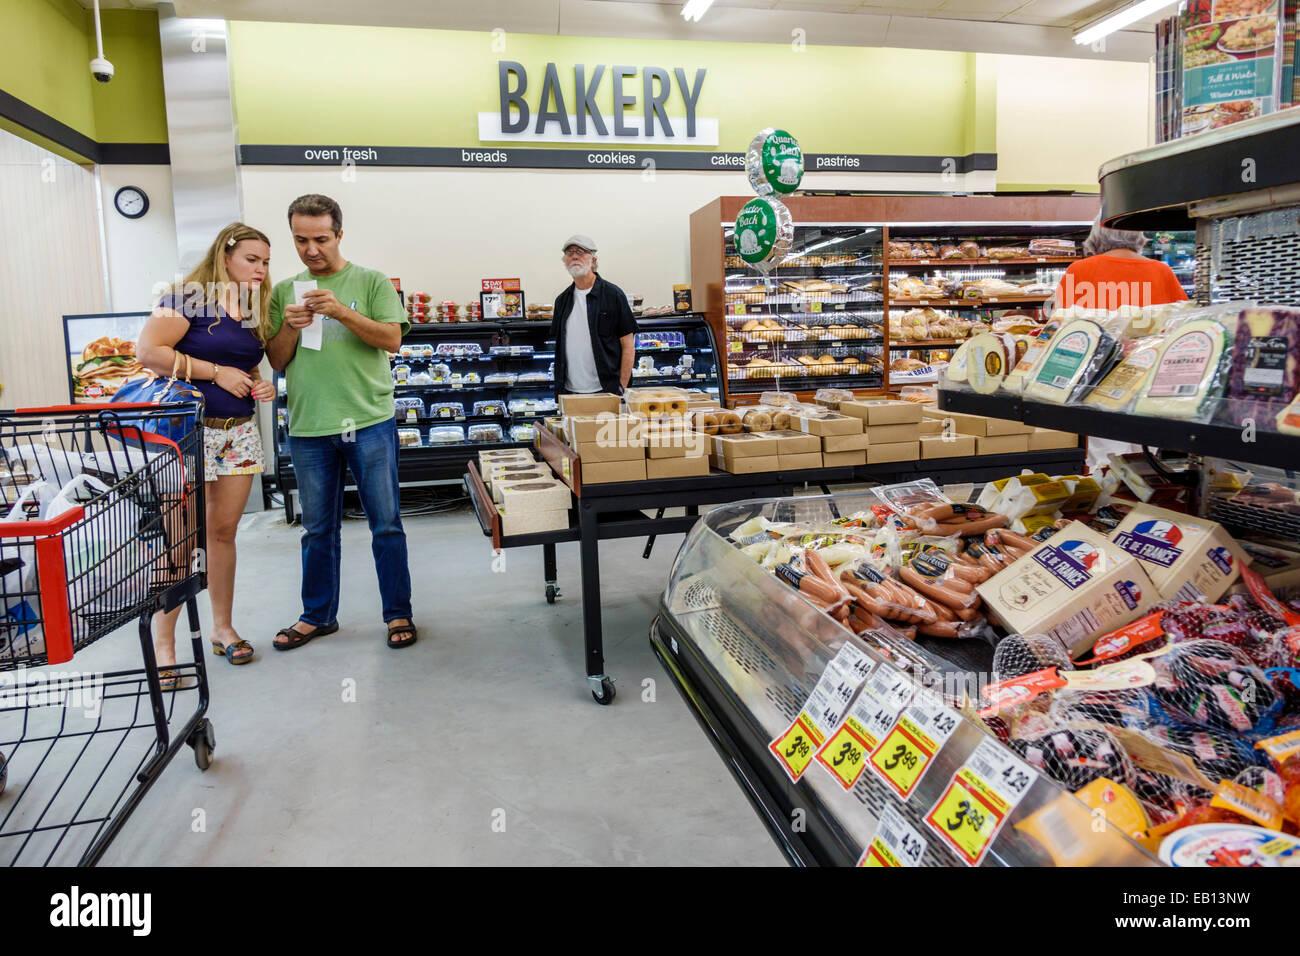 Daytona Beach Florida Winn Dixie Supermarkt Innen Aufsteller Regale Mann Vater Teengirl Tochter Einkaufen Lesen Liste Backerei